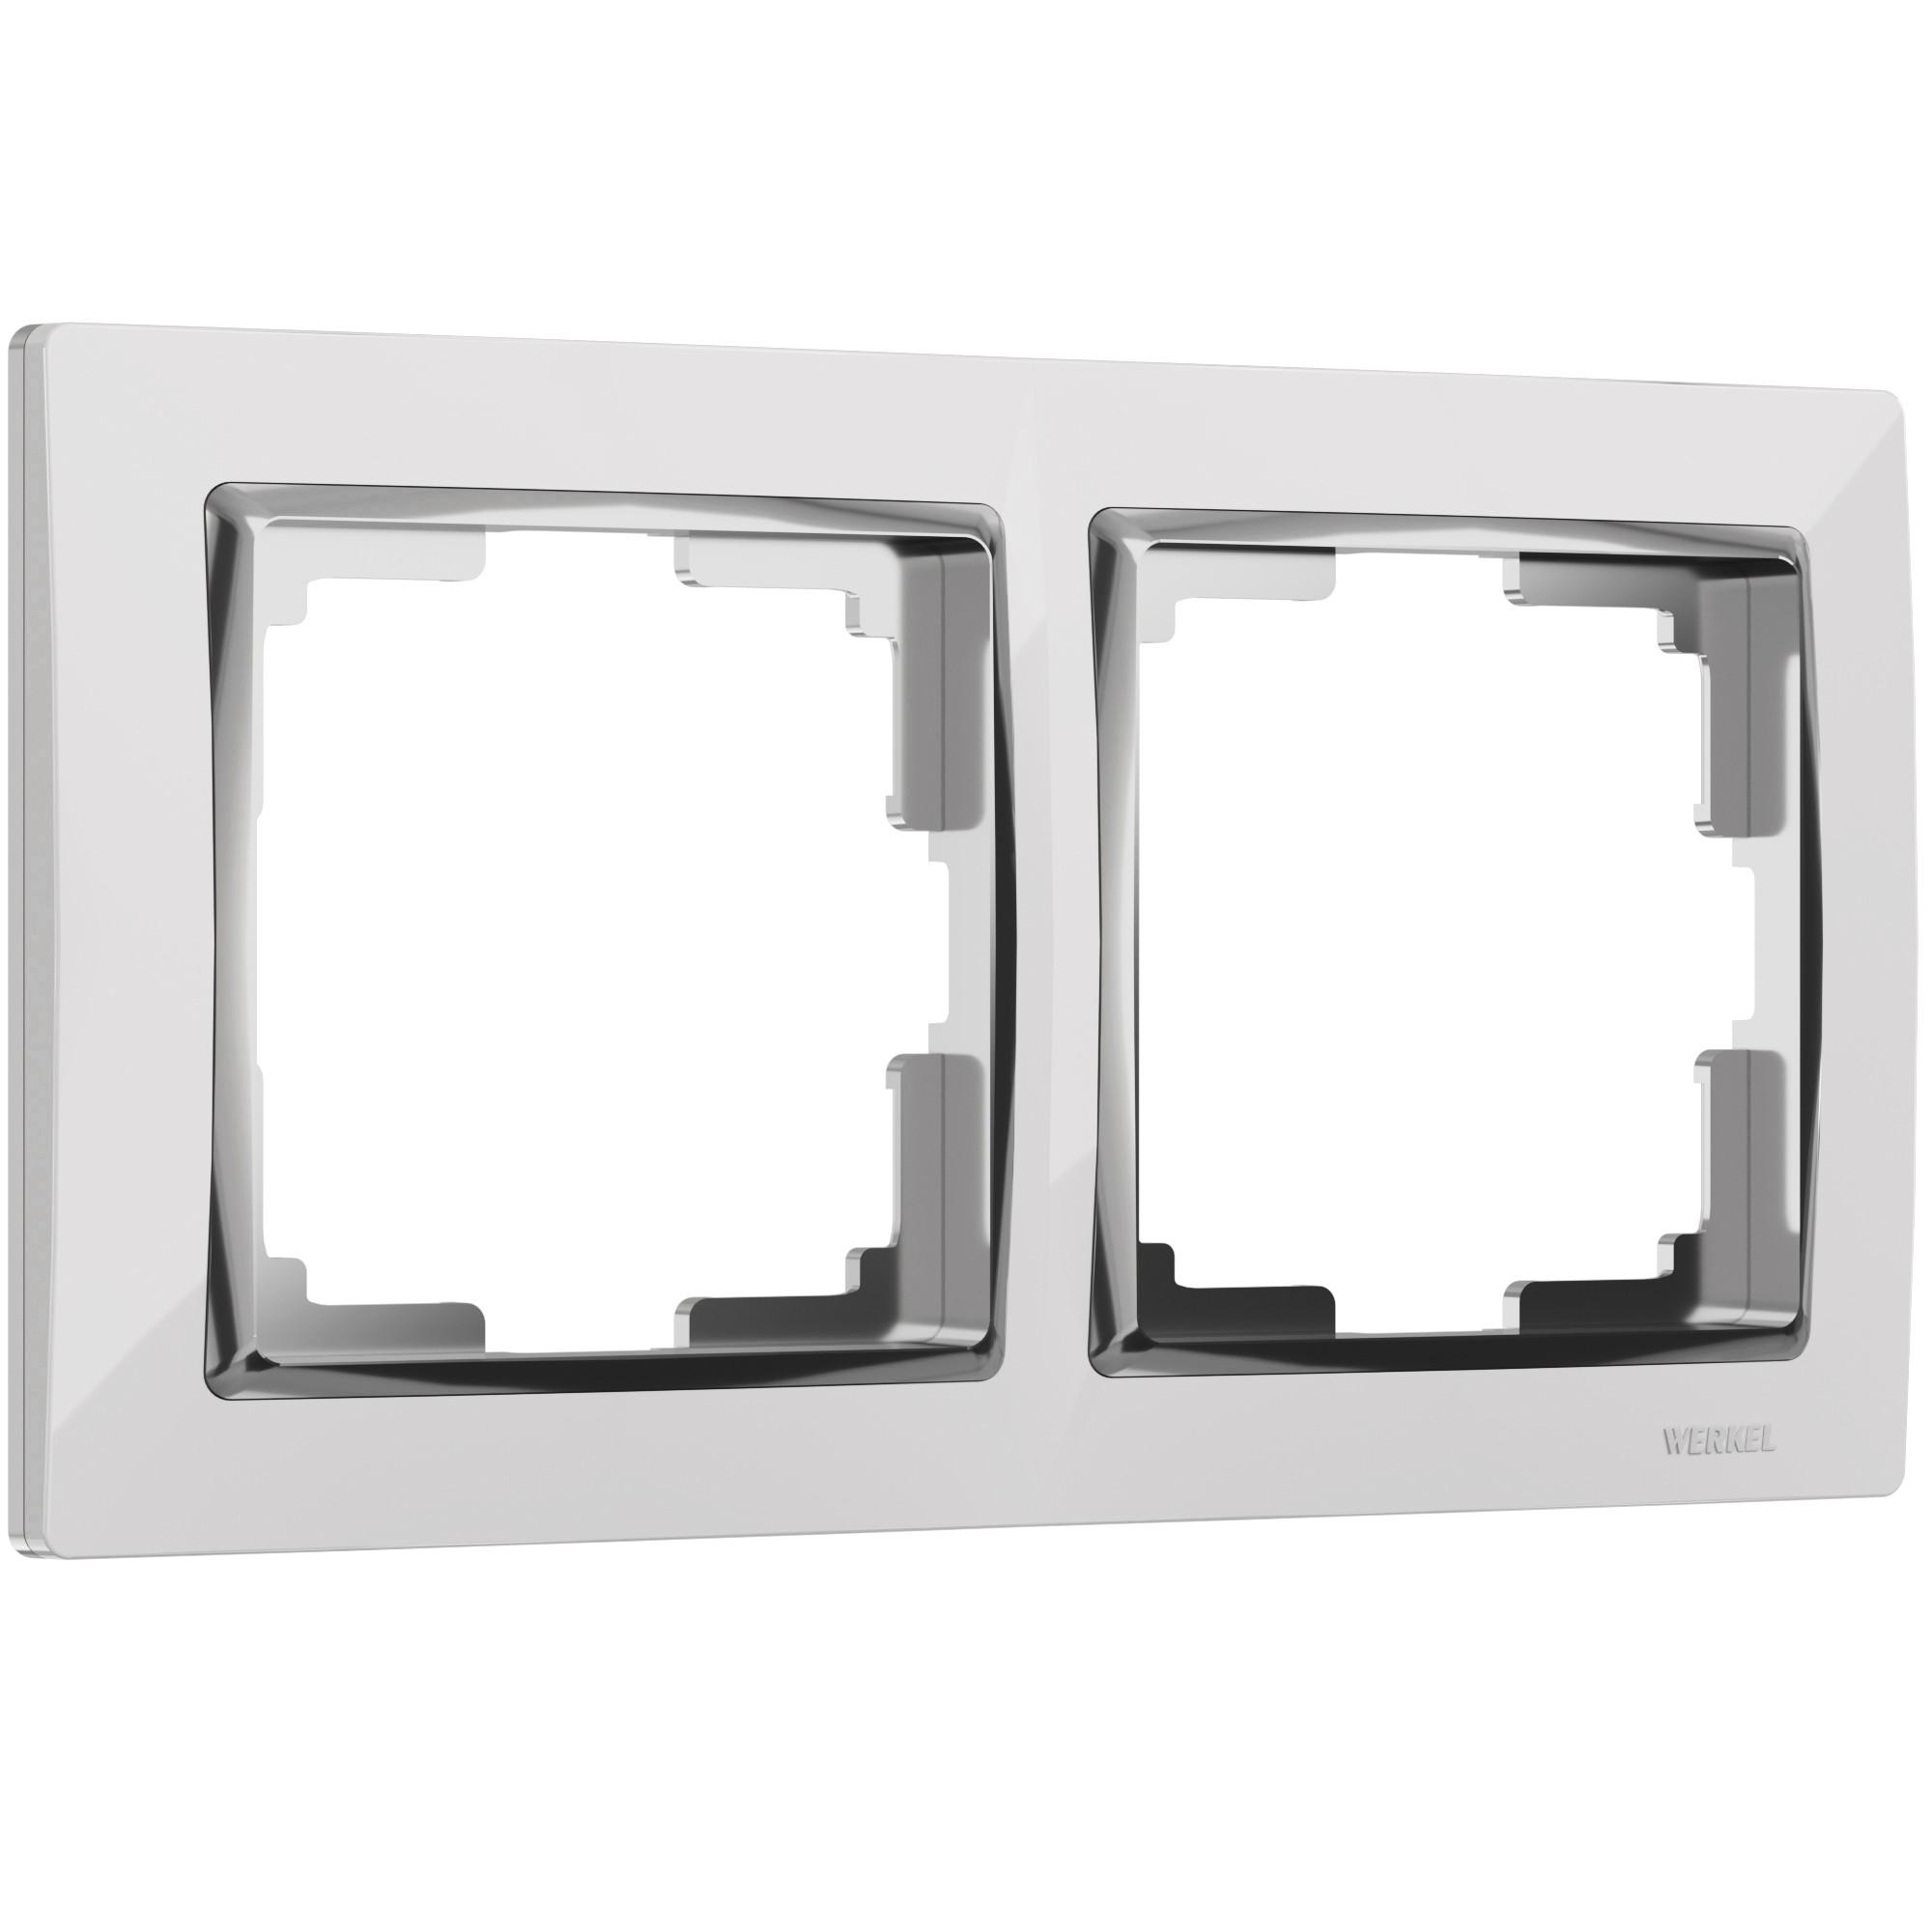 WL03-Frame-02-white /Рамка на 2 поста (белый/хром)